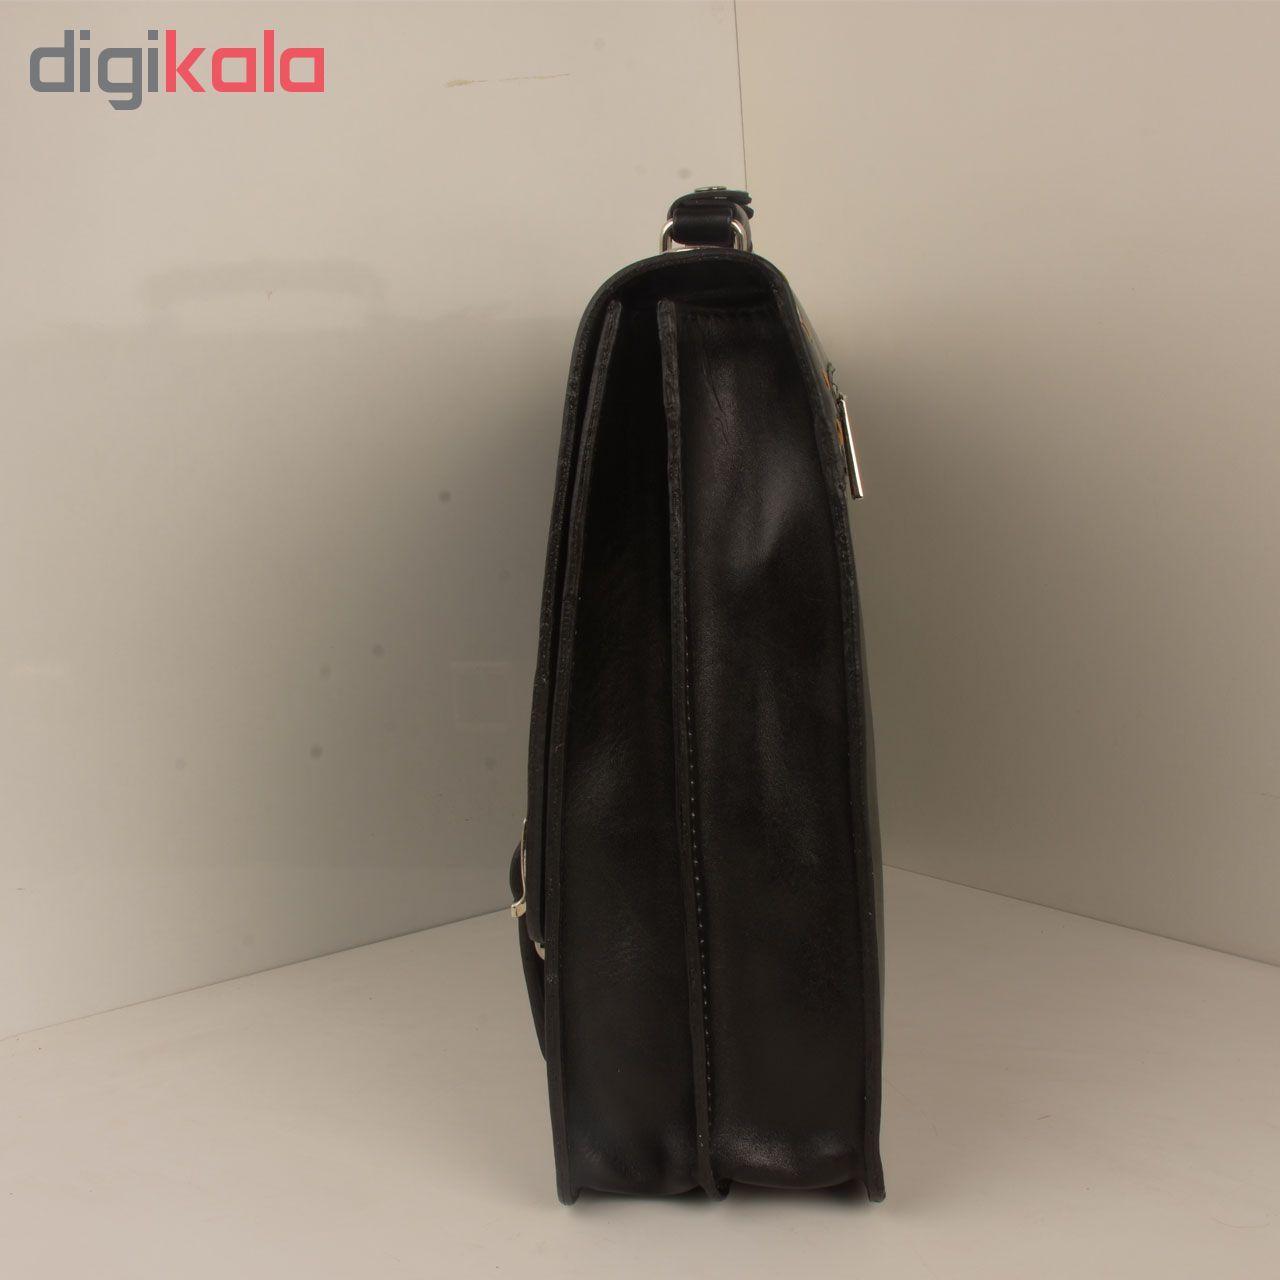 کیف اداری مردانه کهن چرم کد L63-1 main 1 3